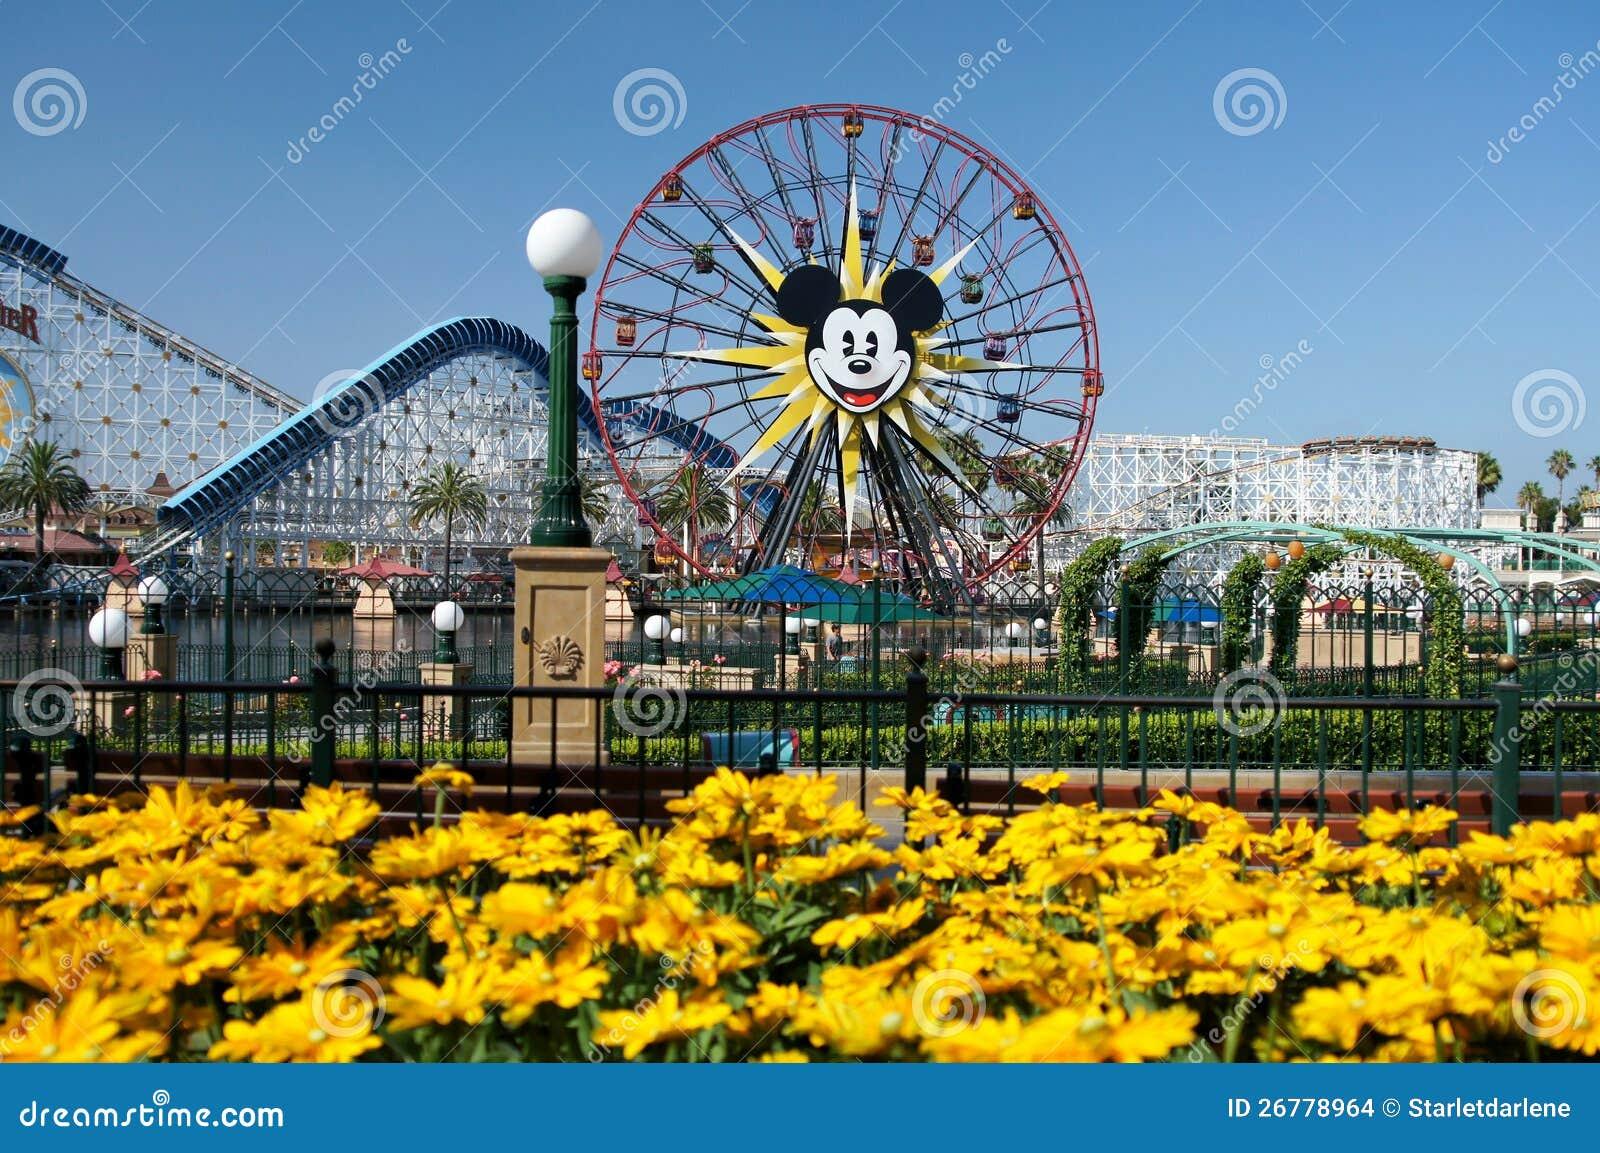 Riesenrad Disneyland Mickey Mouse-